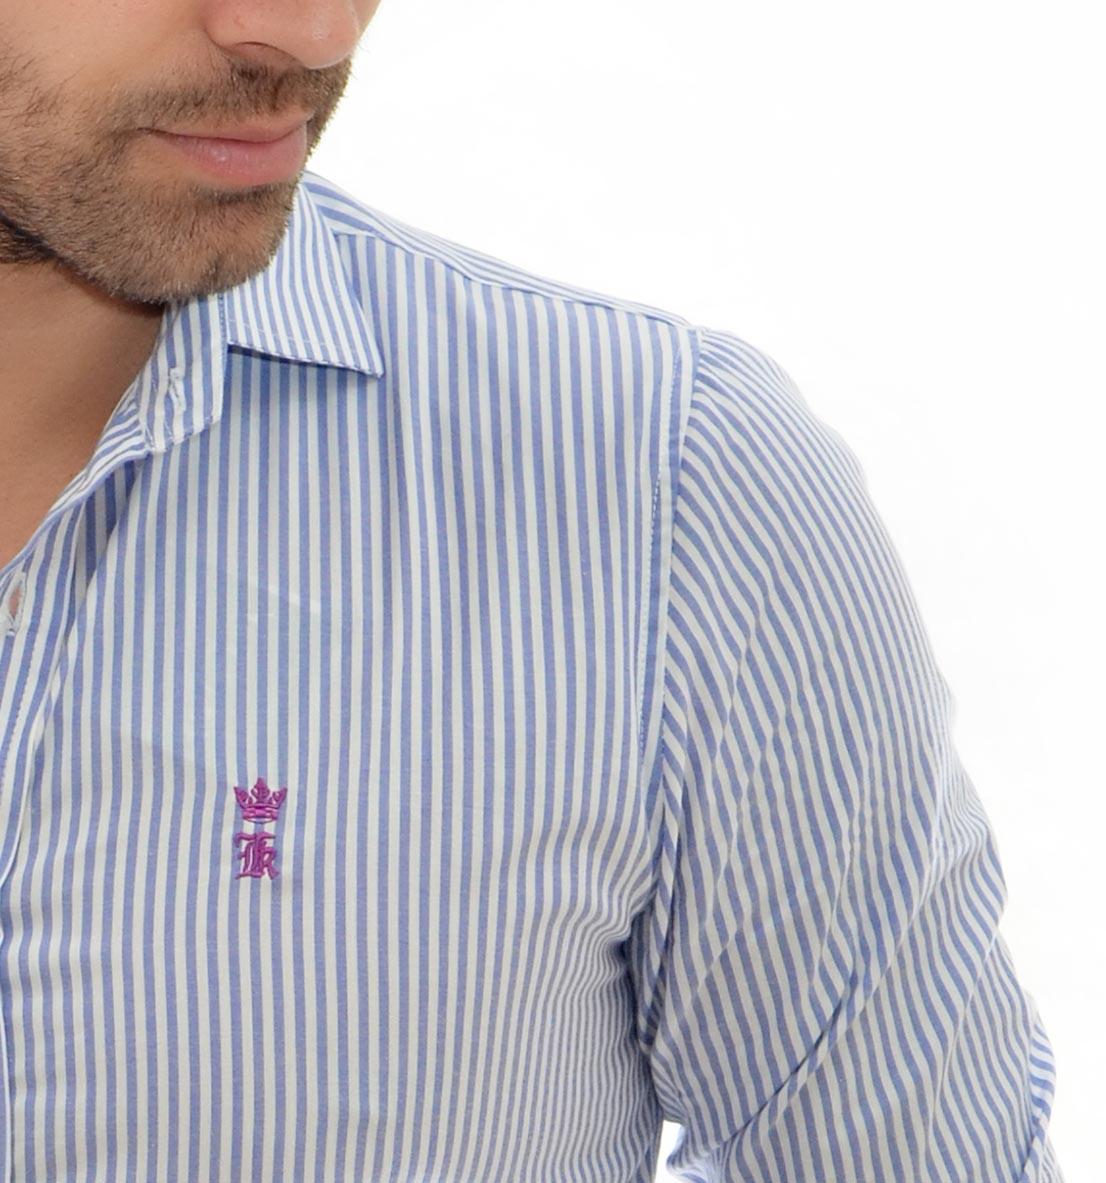 Camisa Social SK Listrada Azul   - Ca Brasileira